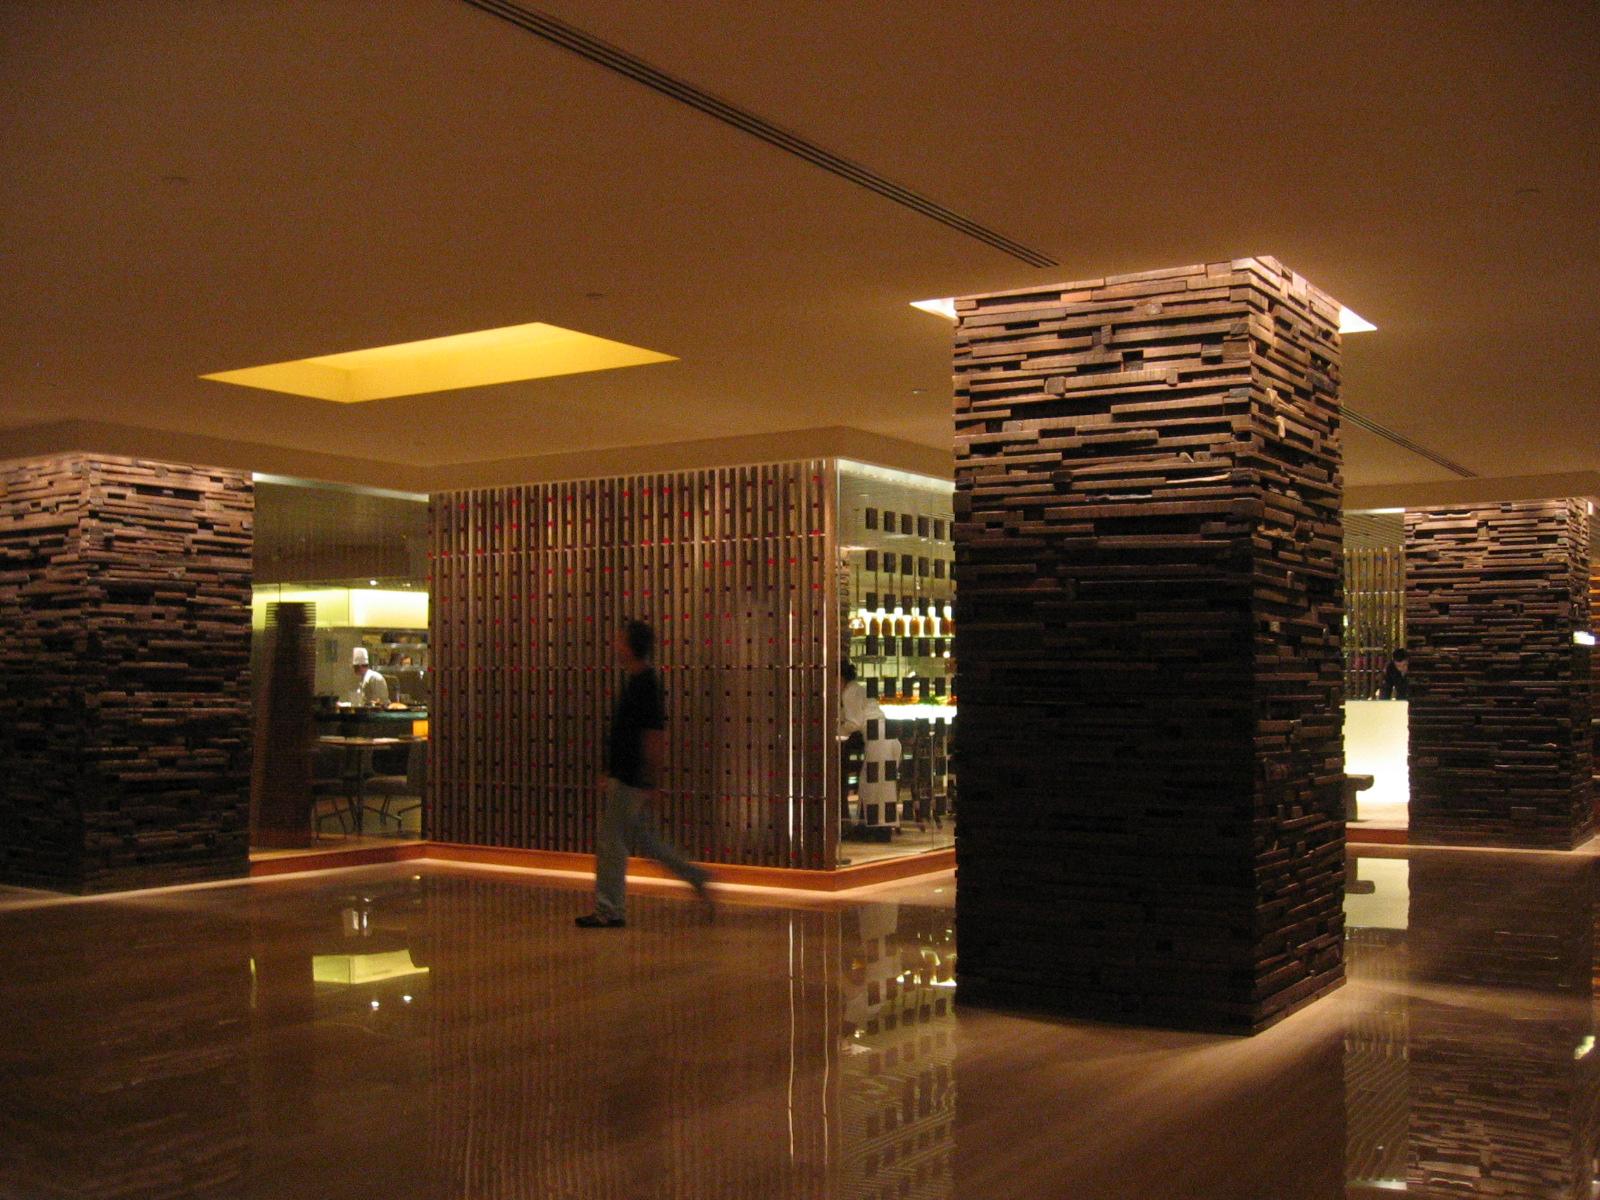 File:Grand Hyatt Singapore 5.JPG - Wikimedia Commons